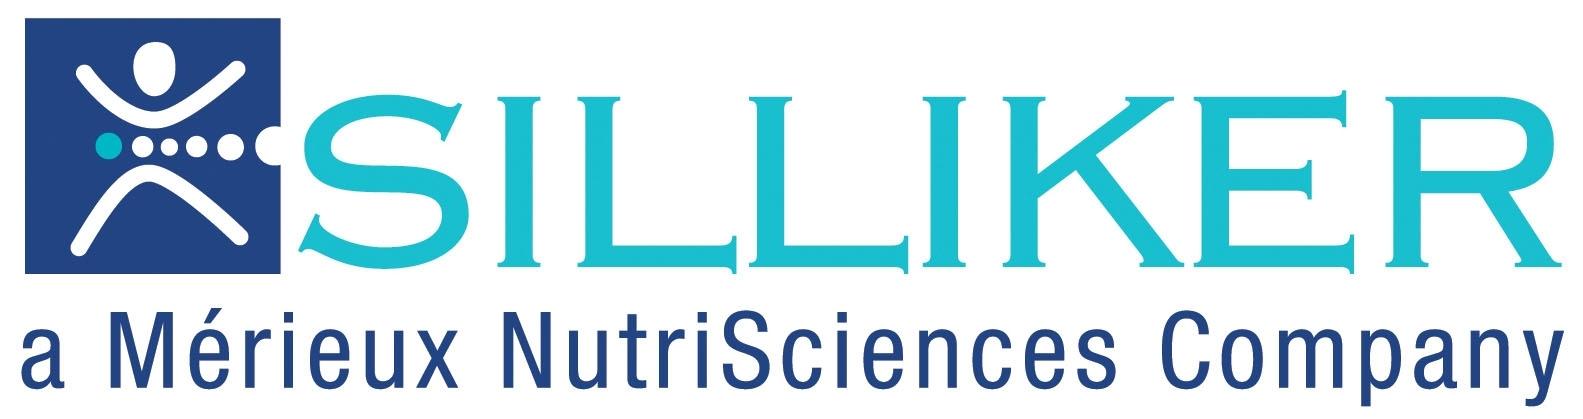 Silliker logo